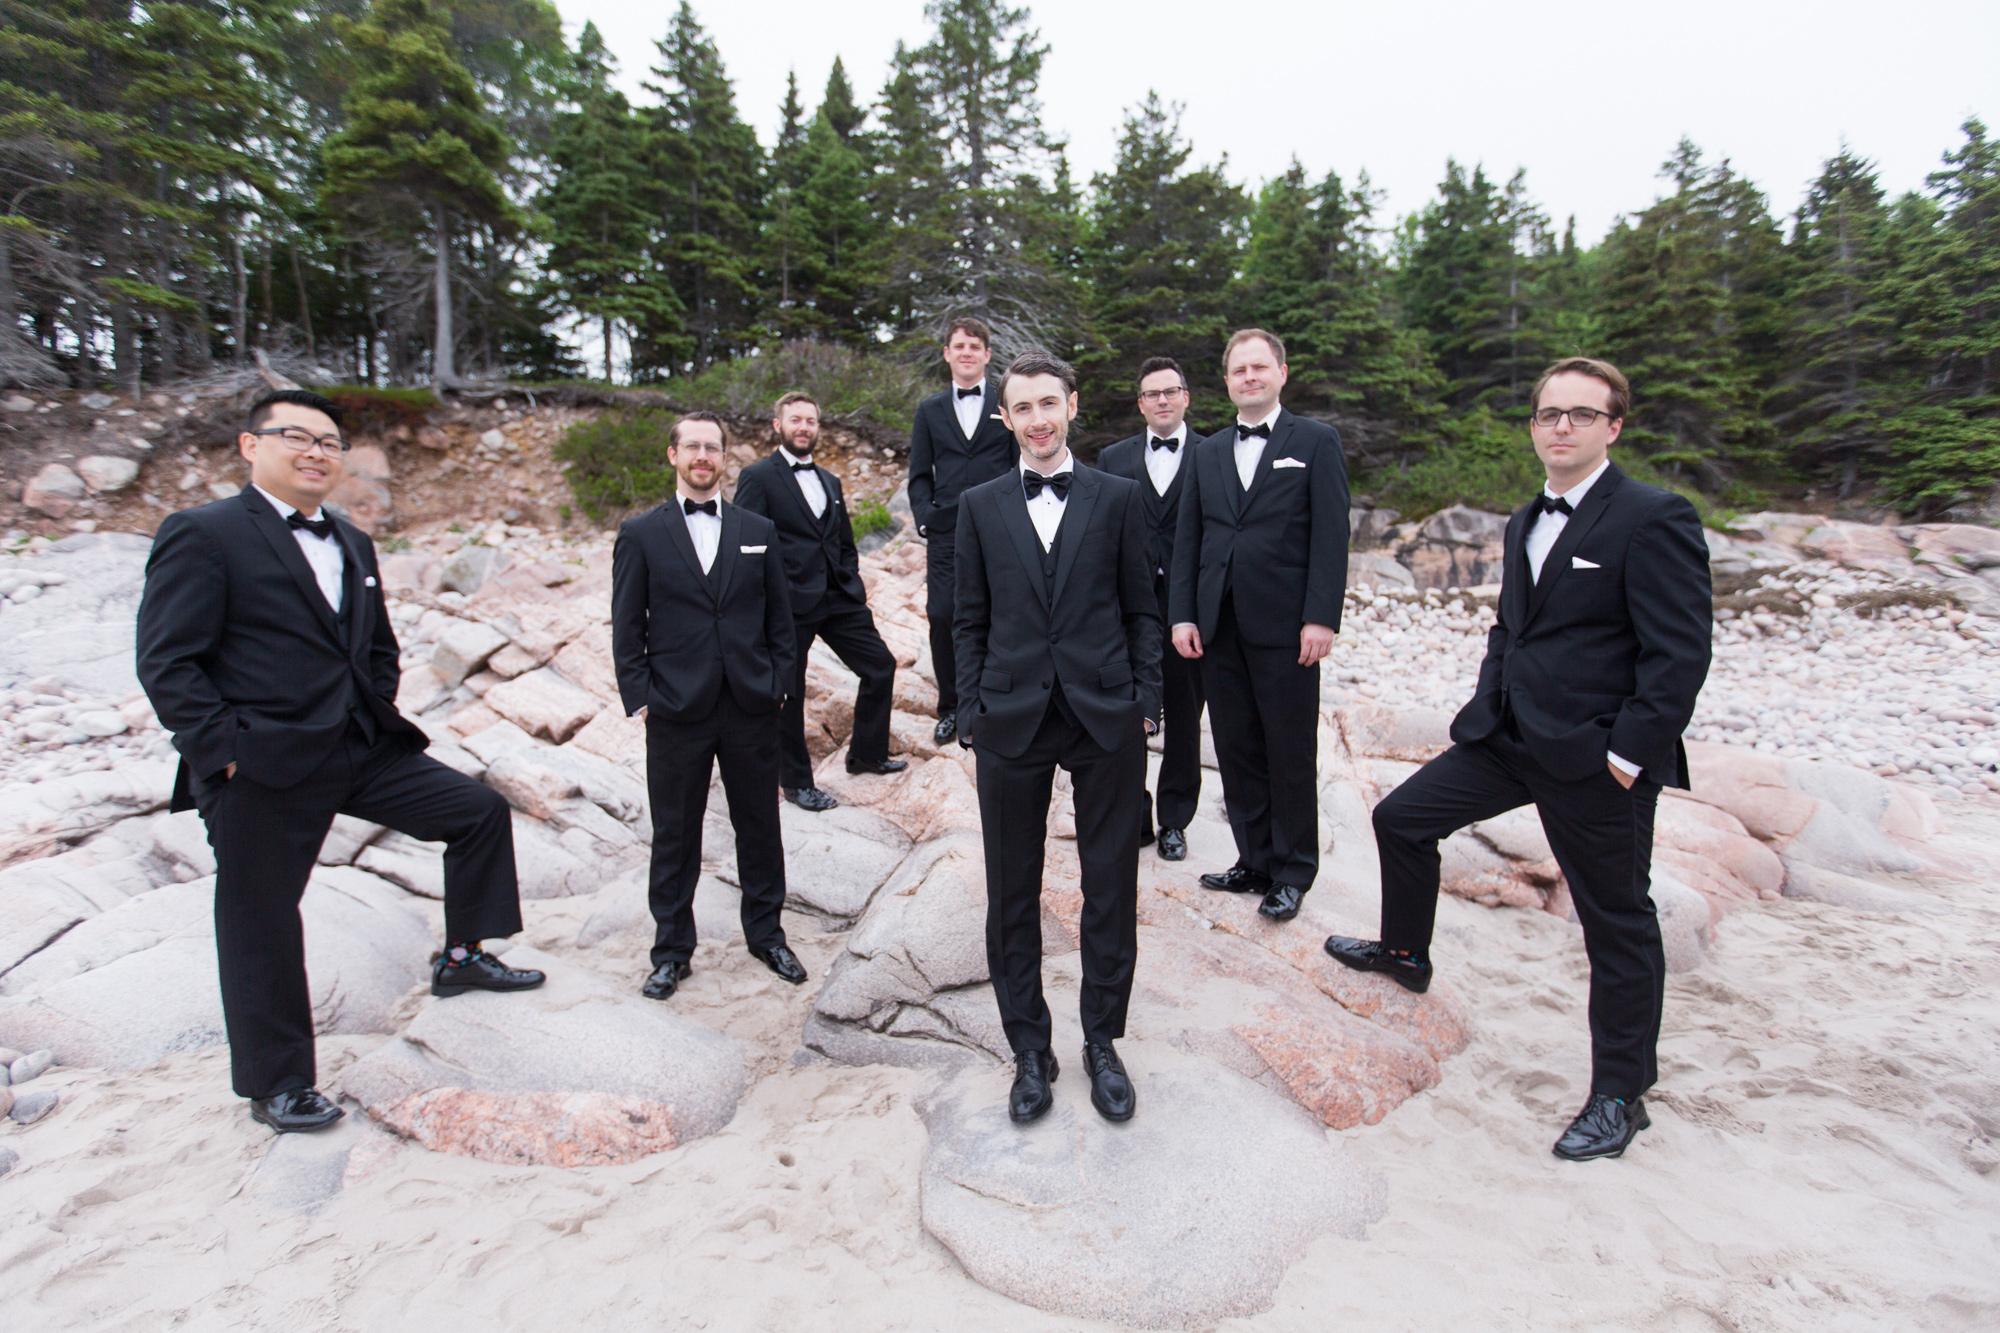 458-halifax-adventure-wedding.jpg